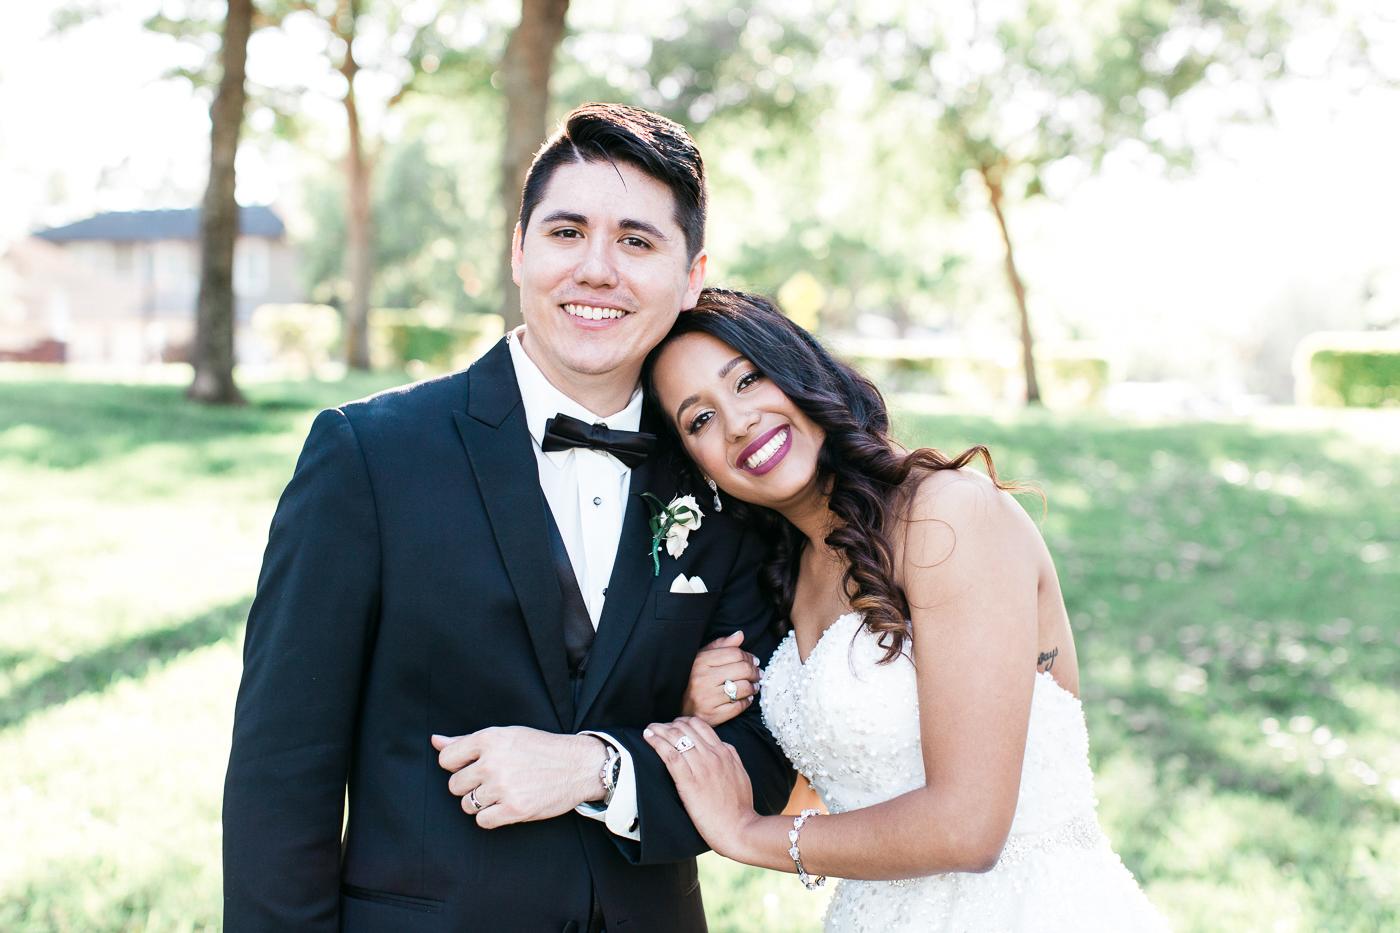 light and airy wedding photographer-1.jpg